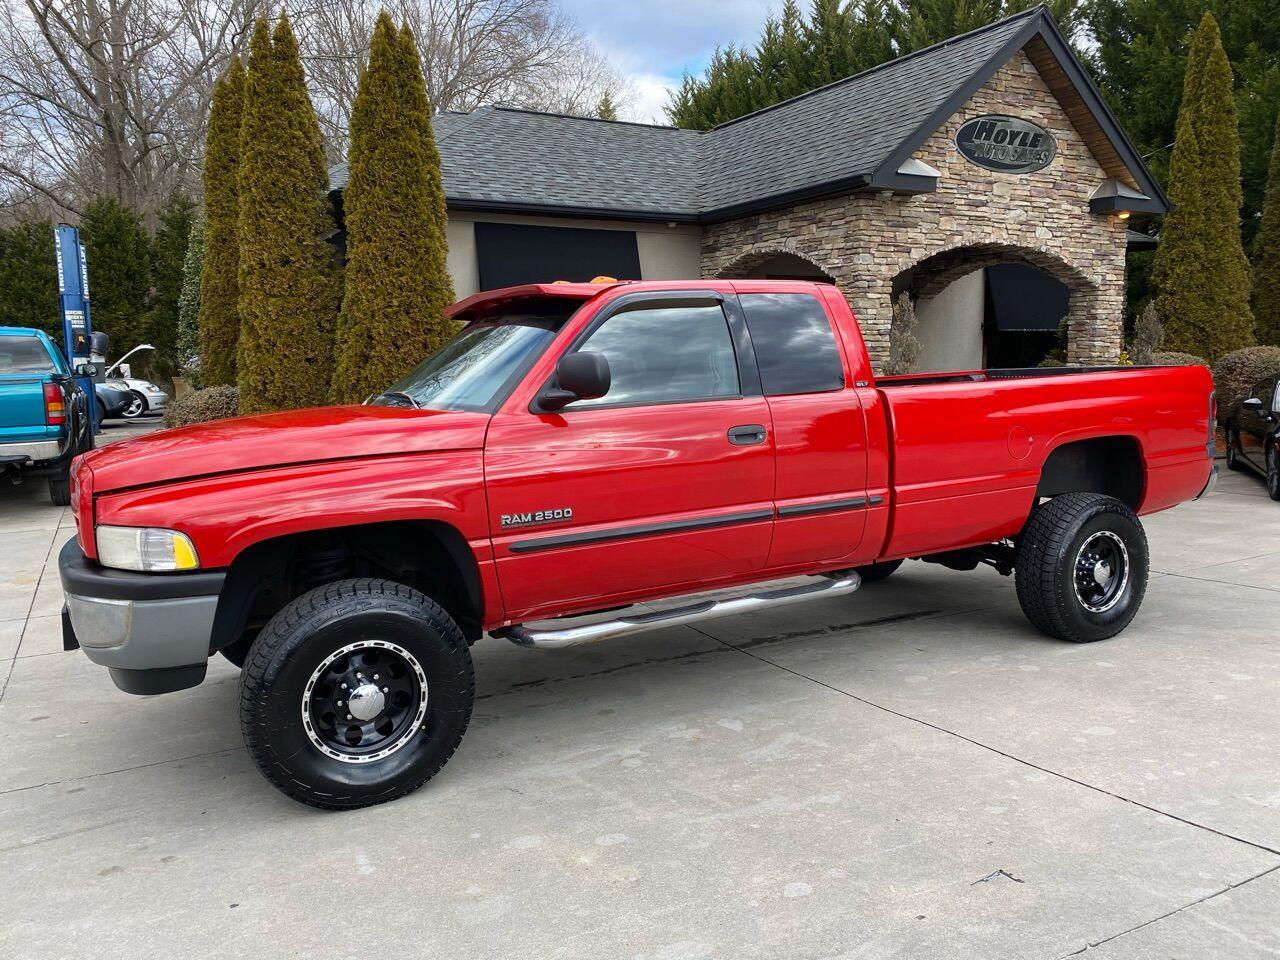 Used 2001 Dodge Ram Pickup 2500 For Sale Carsforsale Com